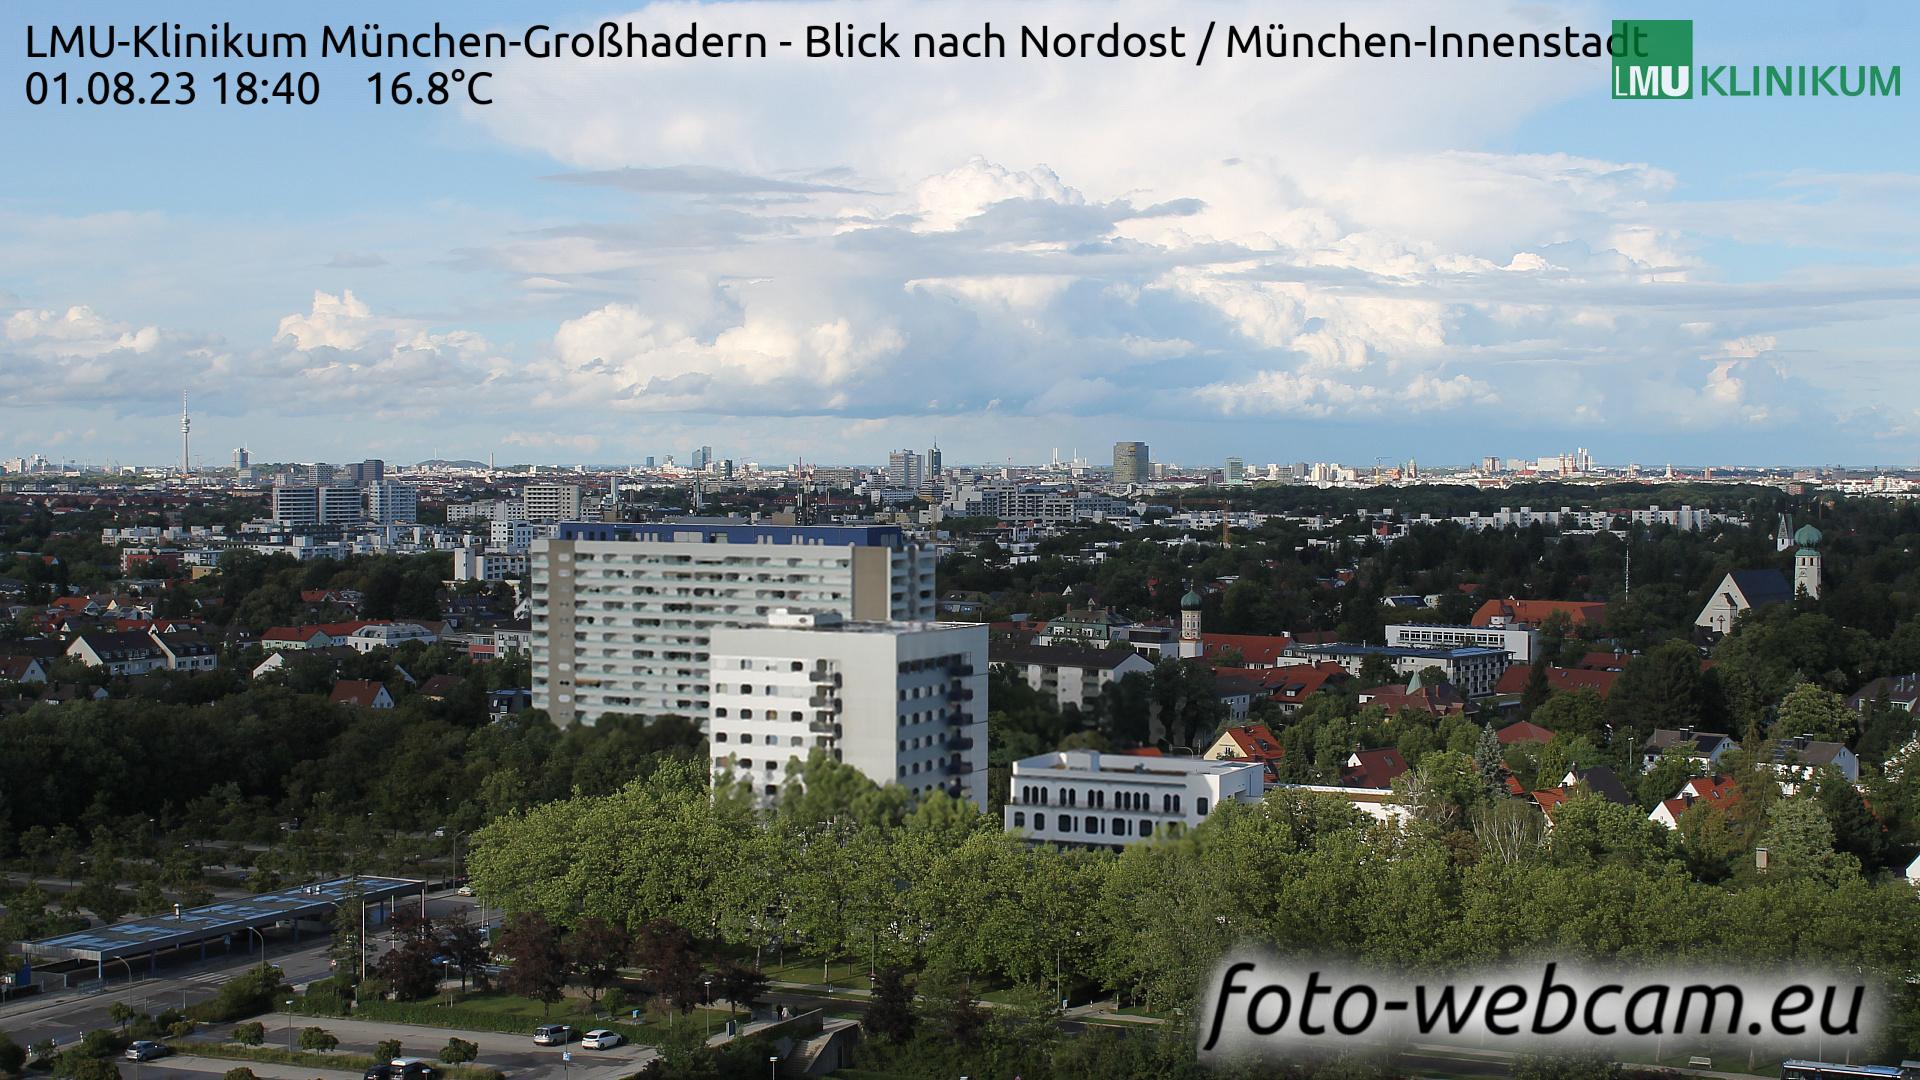 Munich Mon. 18:47